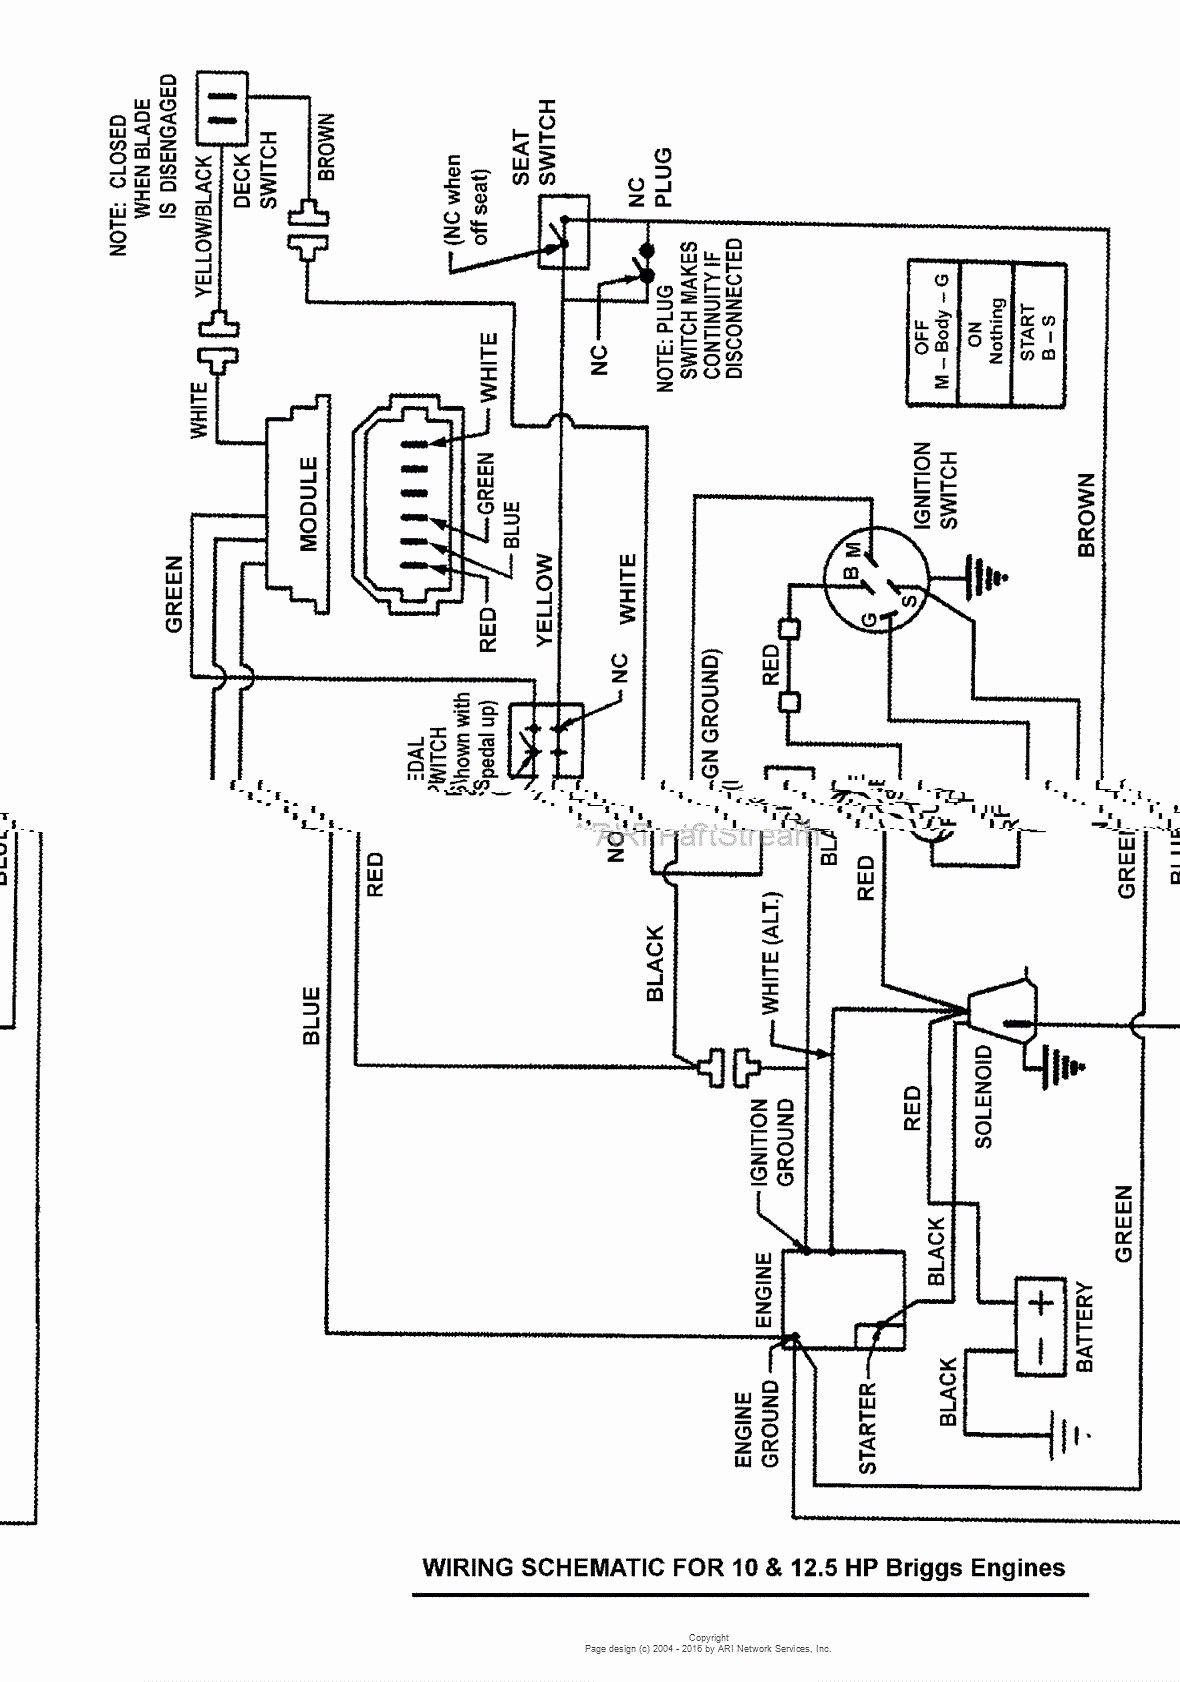 Aircraft Magneto Wiring Diagram